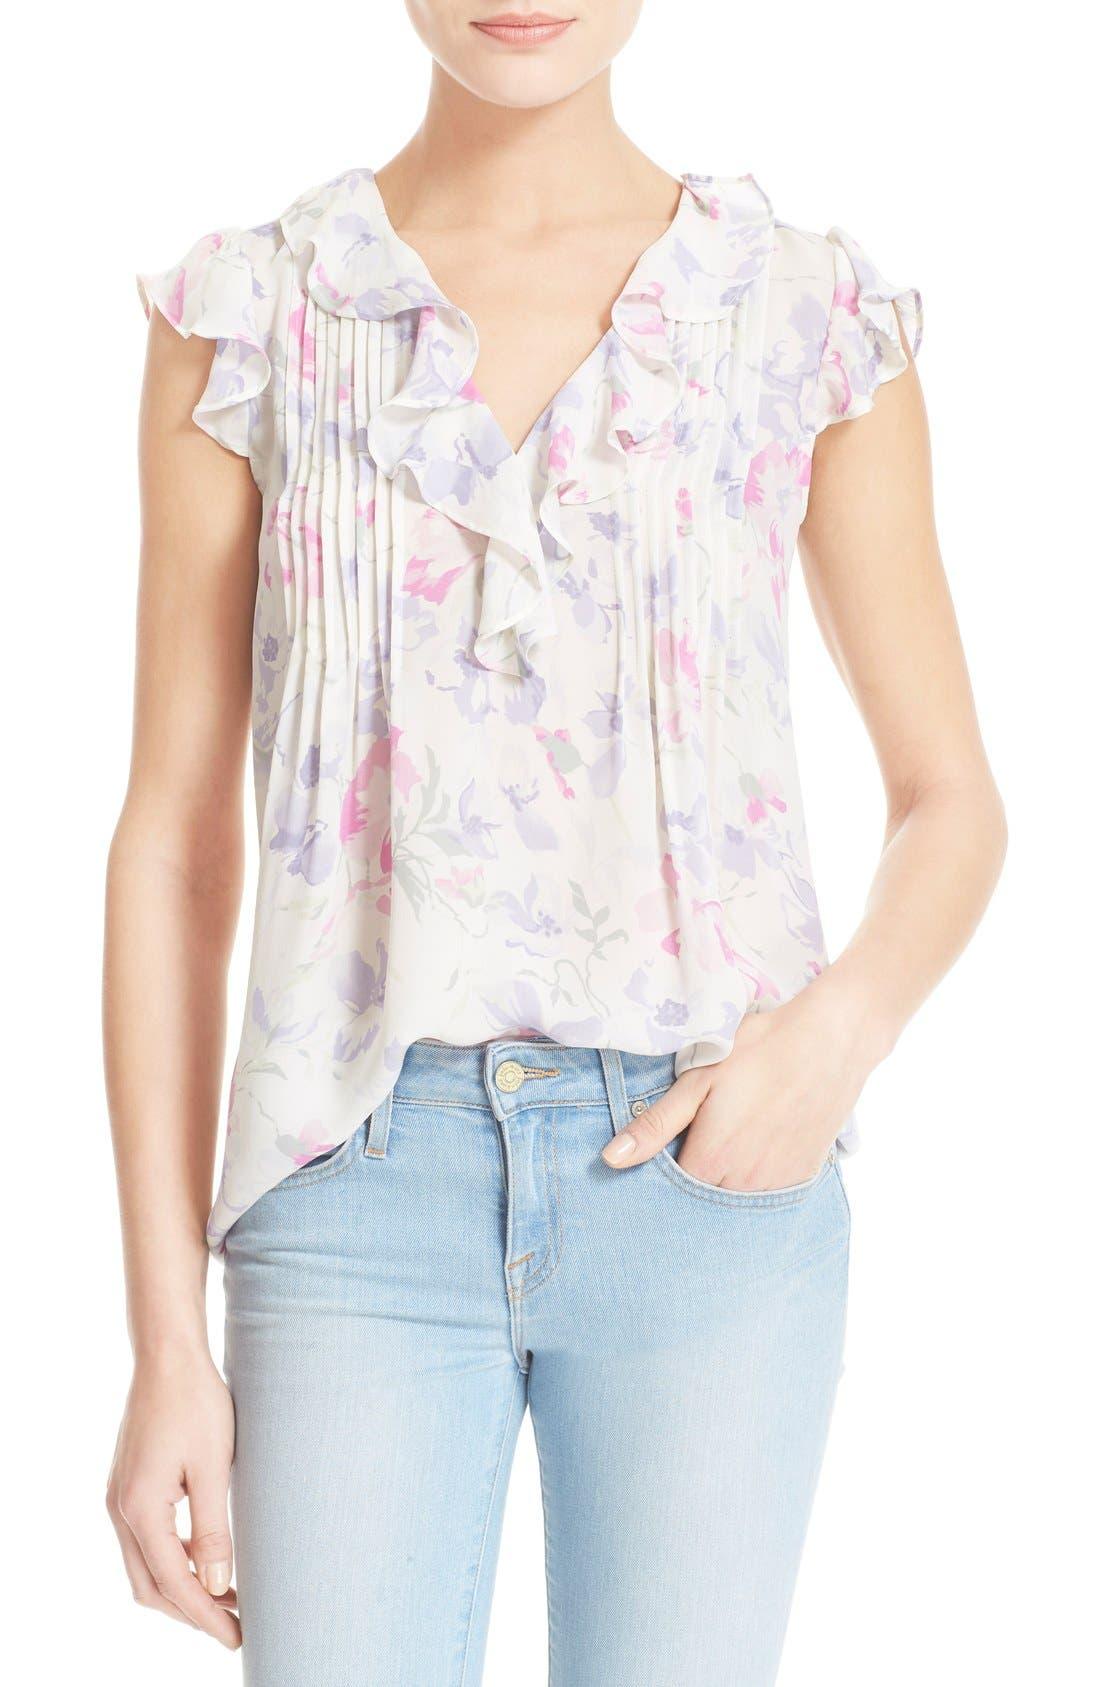 Main Image - Joie 'Olvera' Floral Print Blouse